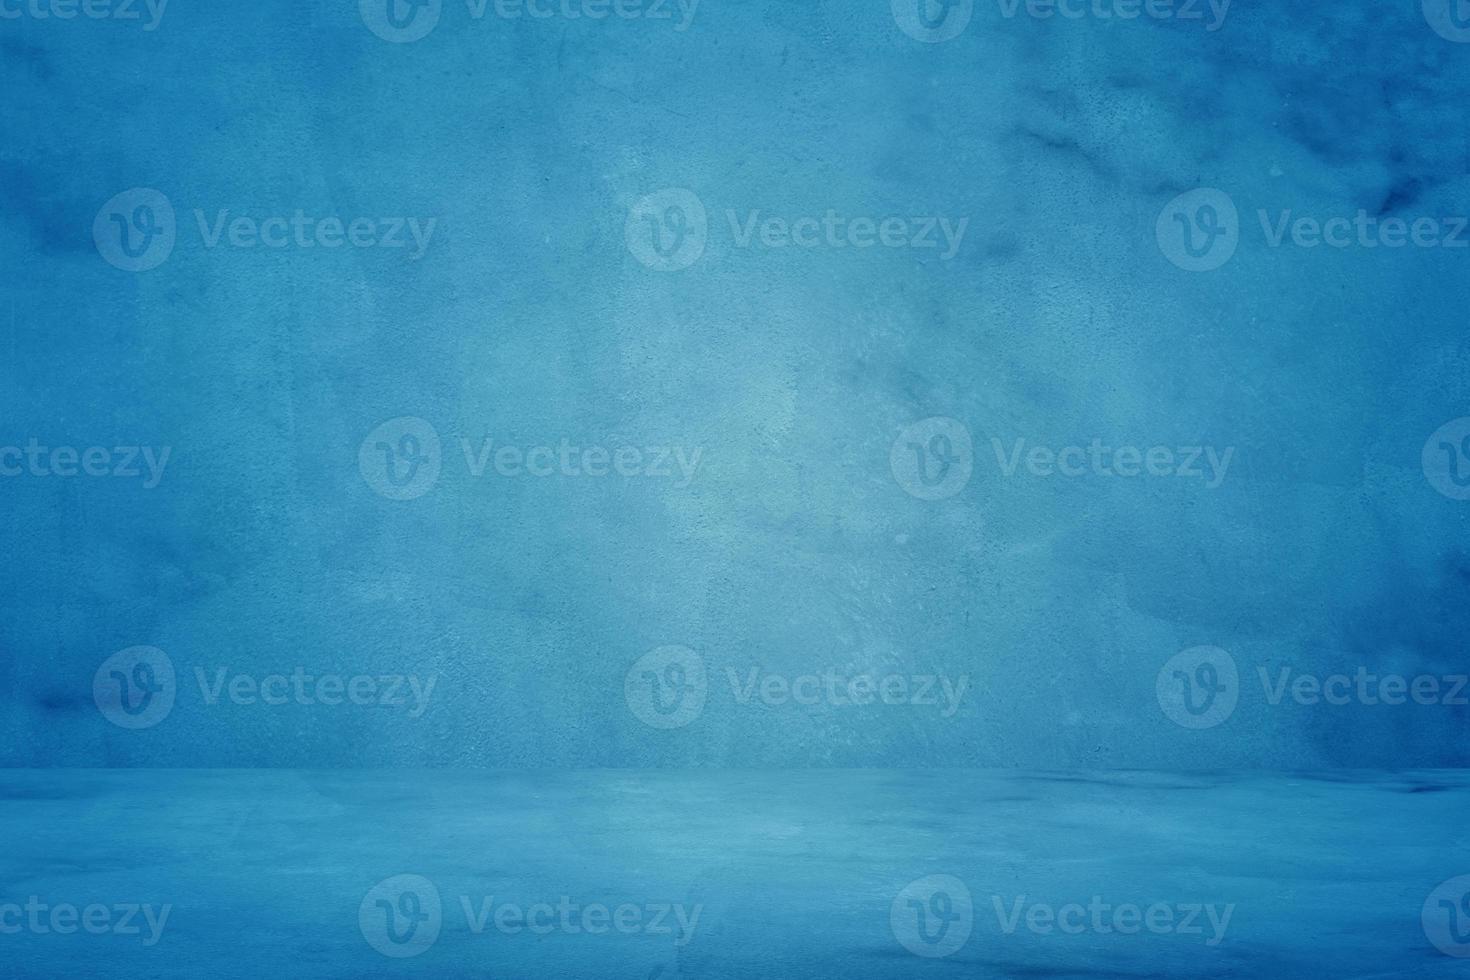 fondo de estudio azul foto